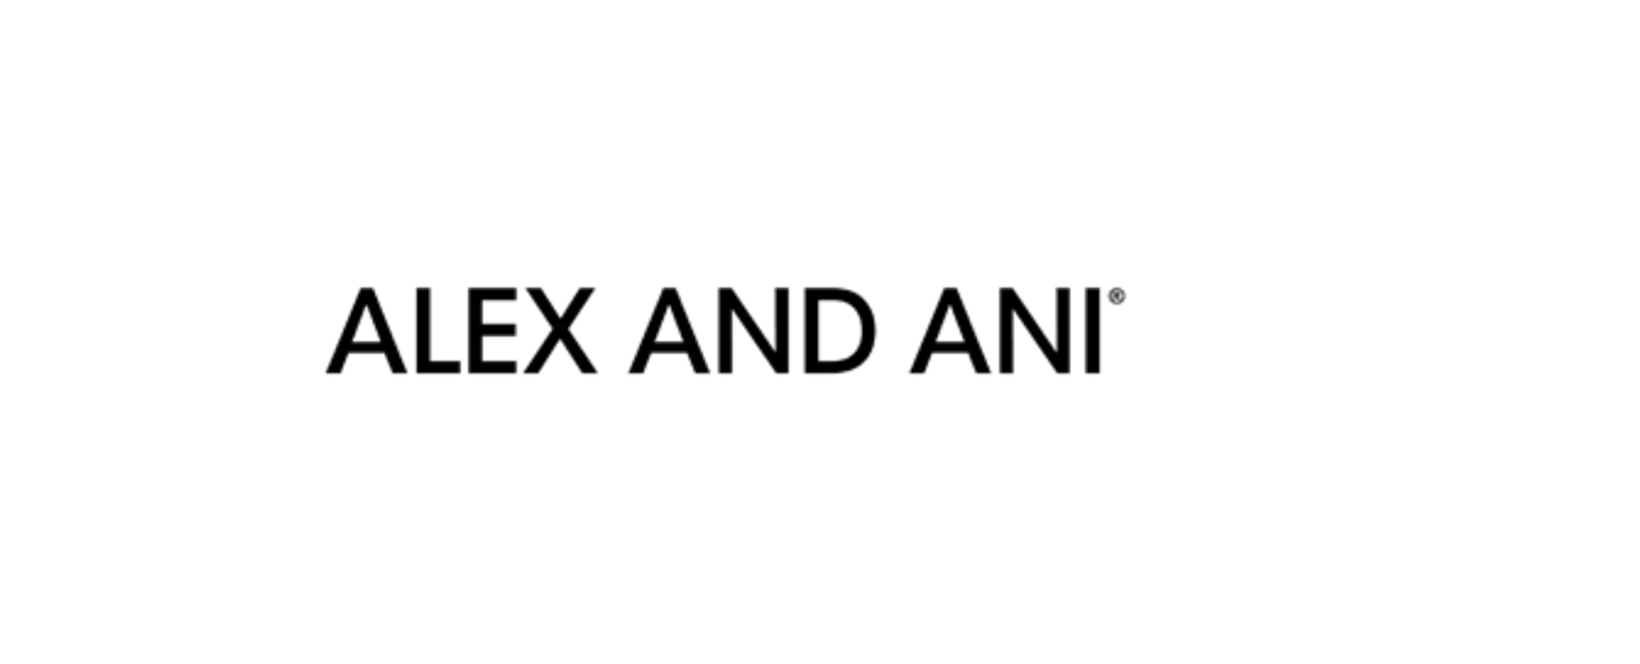 Alex and Ani Discount Code 2021